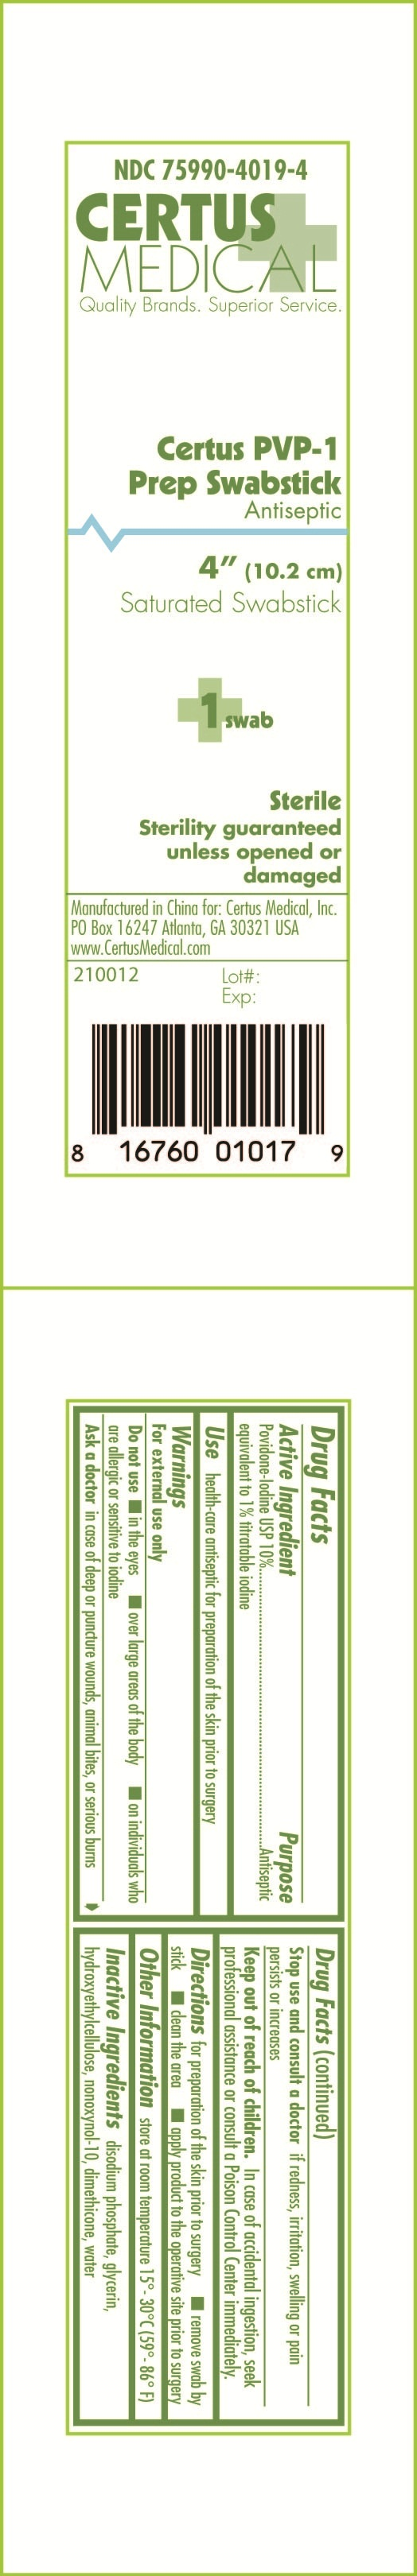 Certus Pvp-1 Prep Swabstick (Povidone-iodine) Swab [Certus Medical, Inc.]